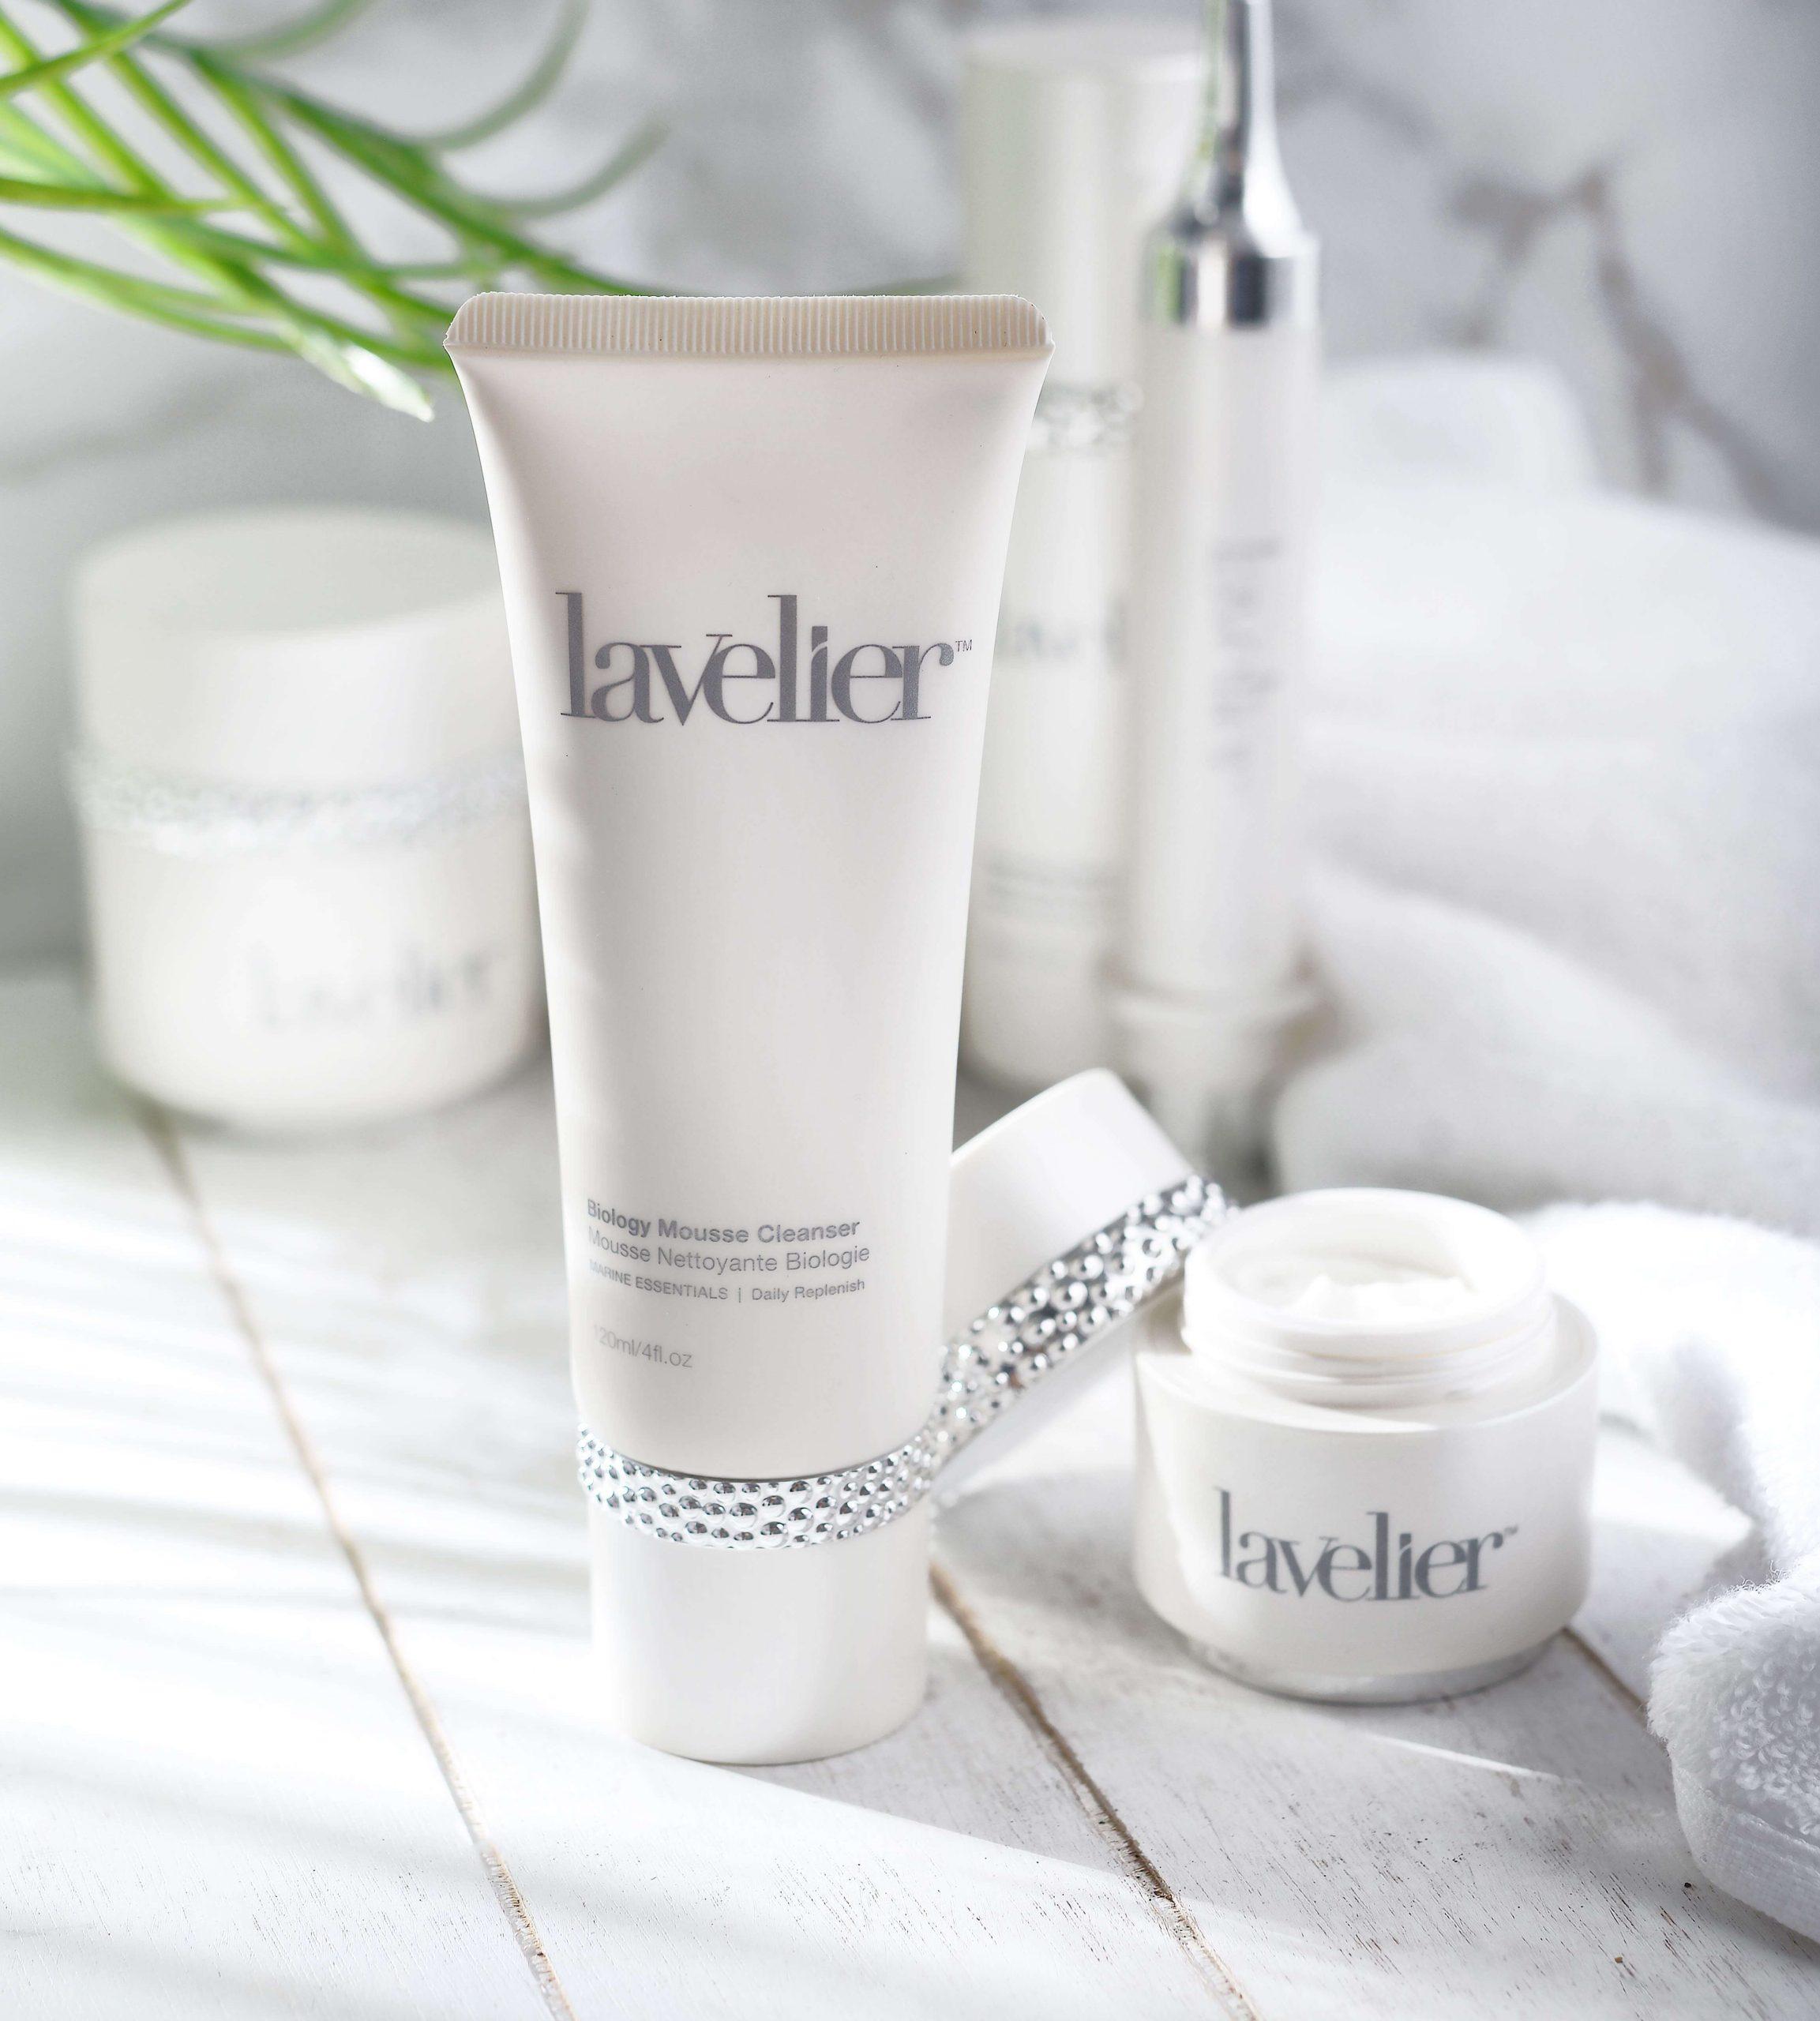 Lavelier Reviews: Biology Mousse Cleanser